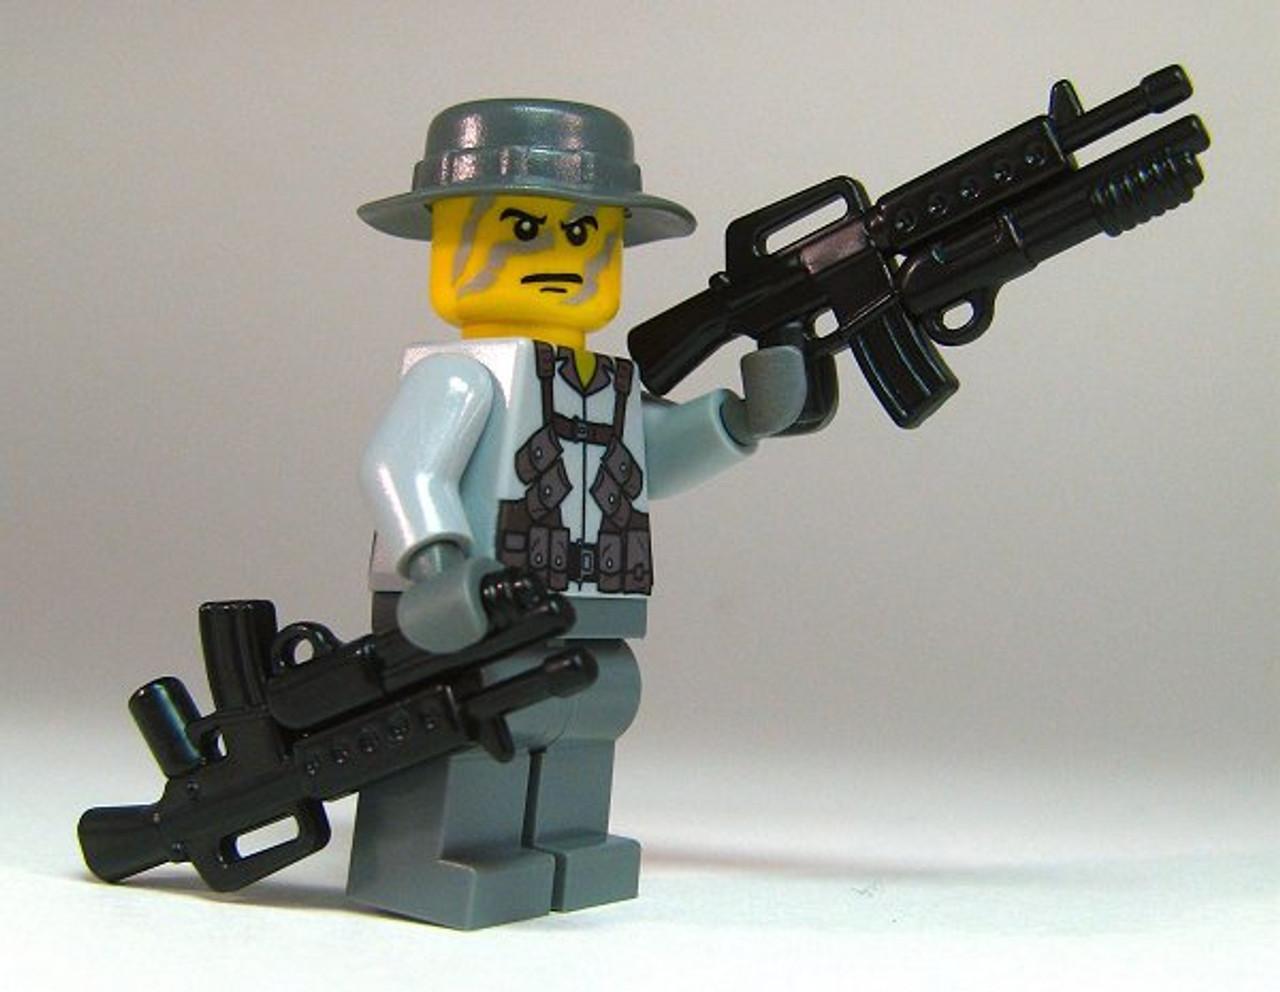 BrickArms Black M16 DBR Rifle Weapons for Brick Minifigures